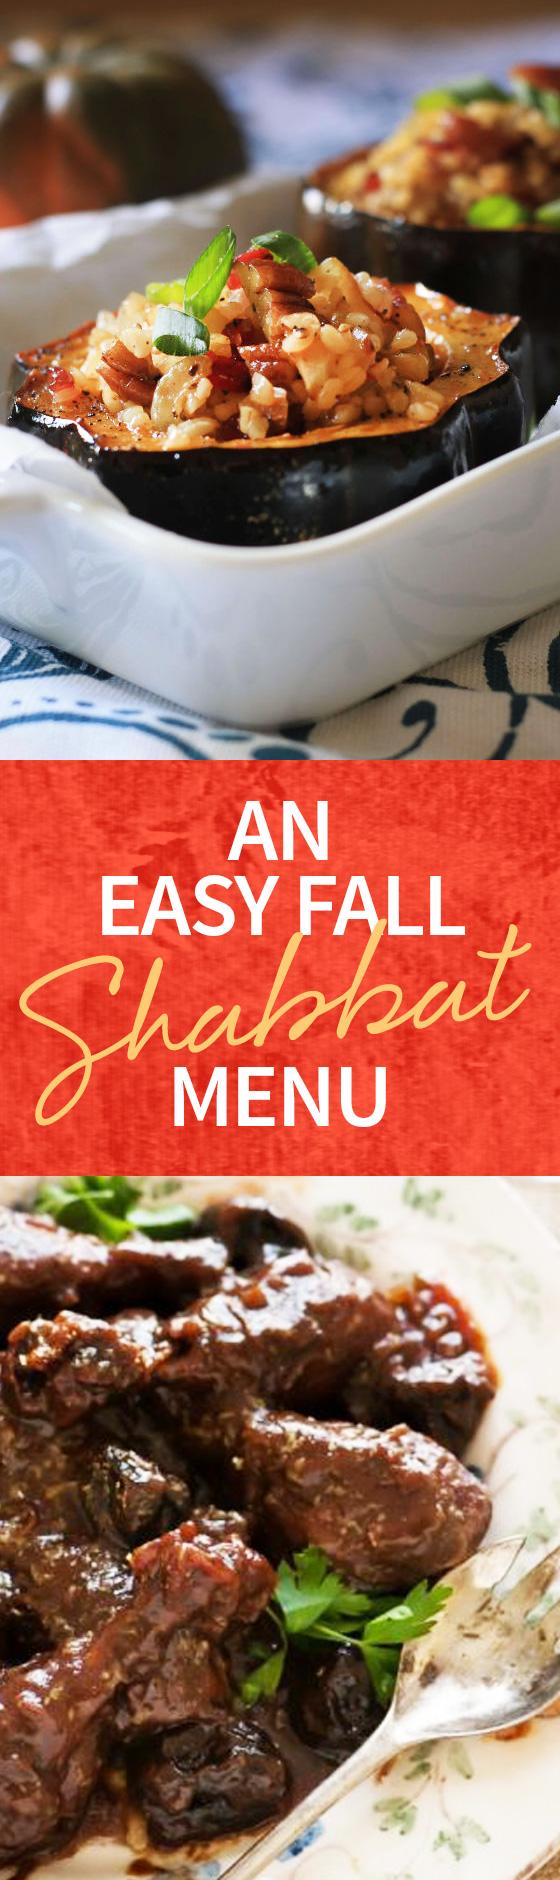 Easy Fall Shabbat Menu Kosher Cooking Jewish Cuisine Jewish Cooking